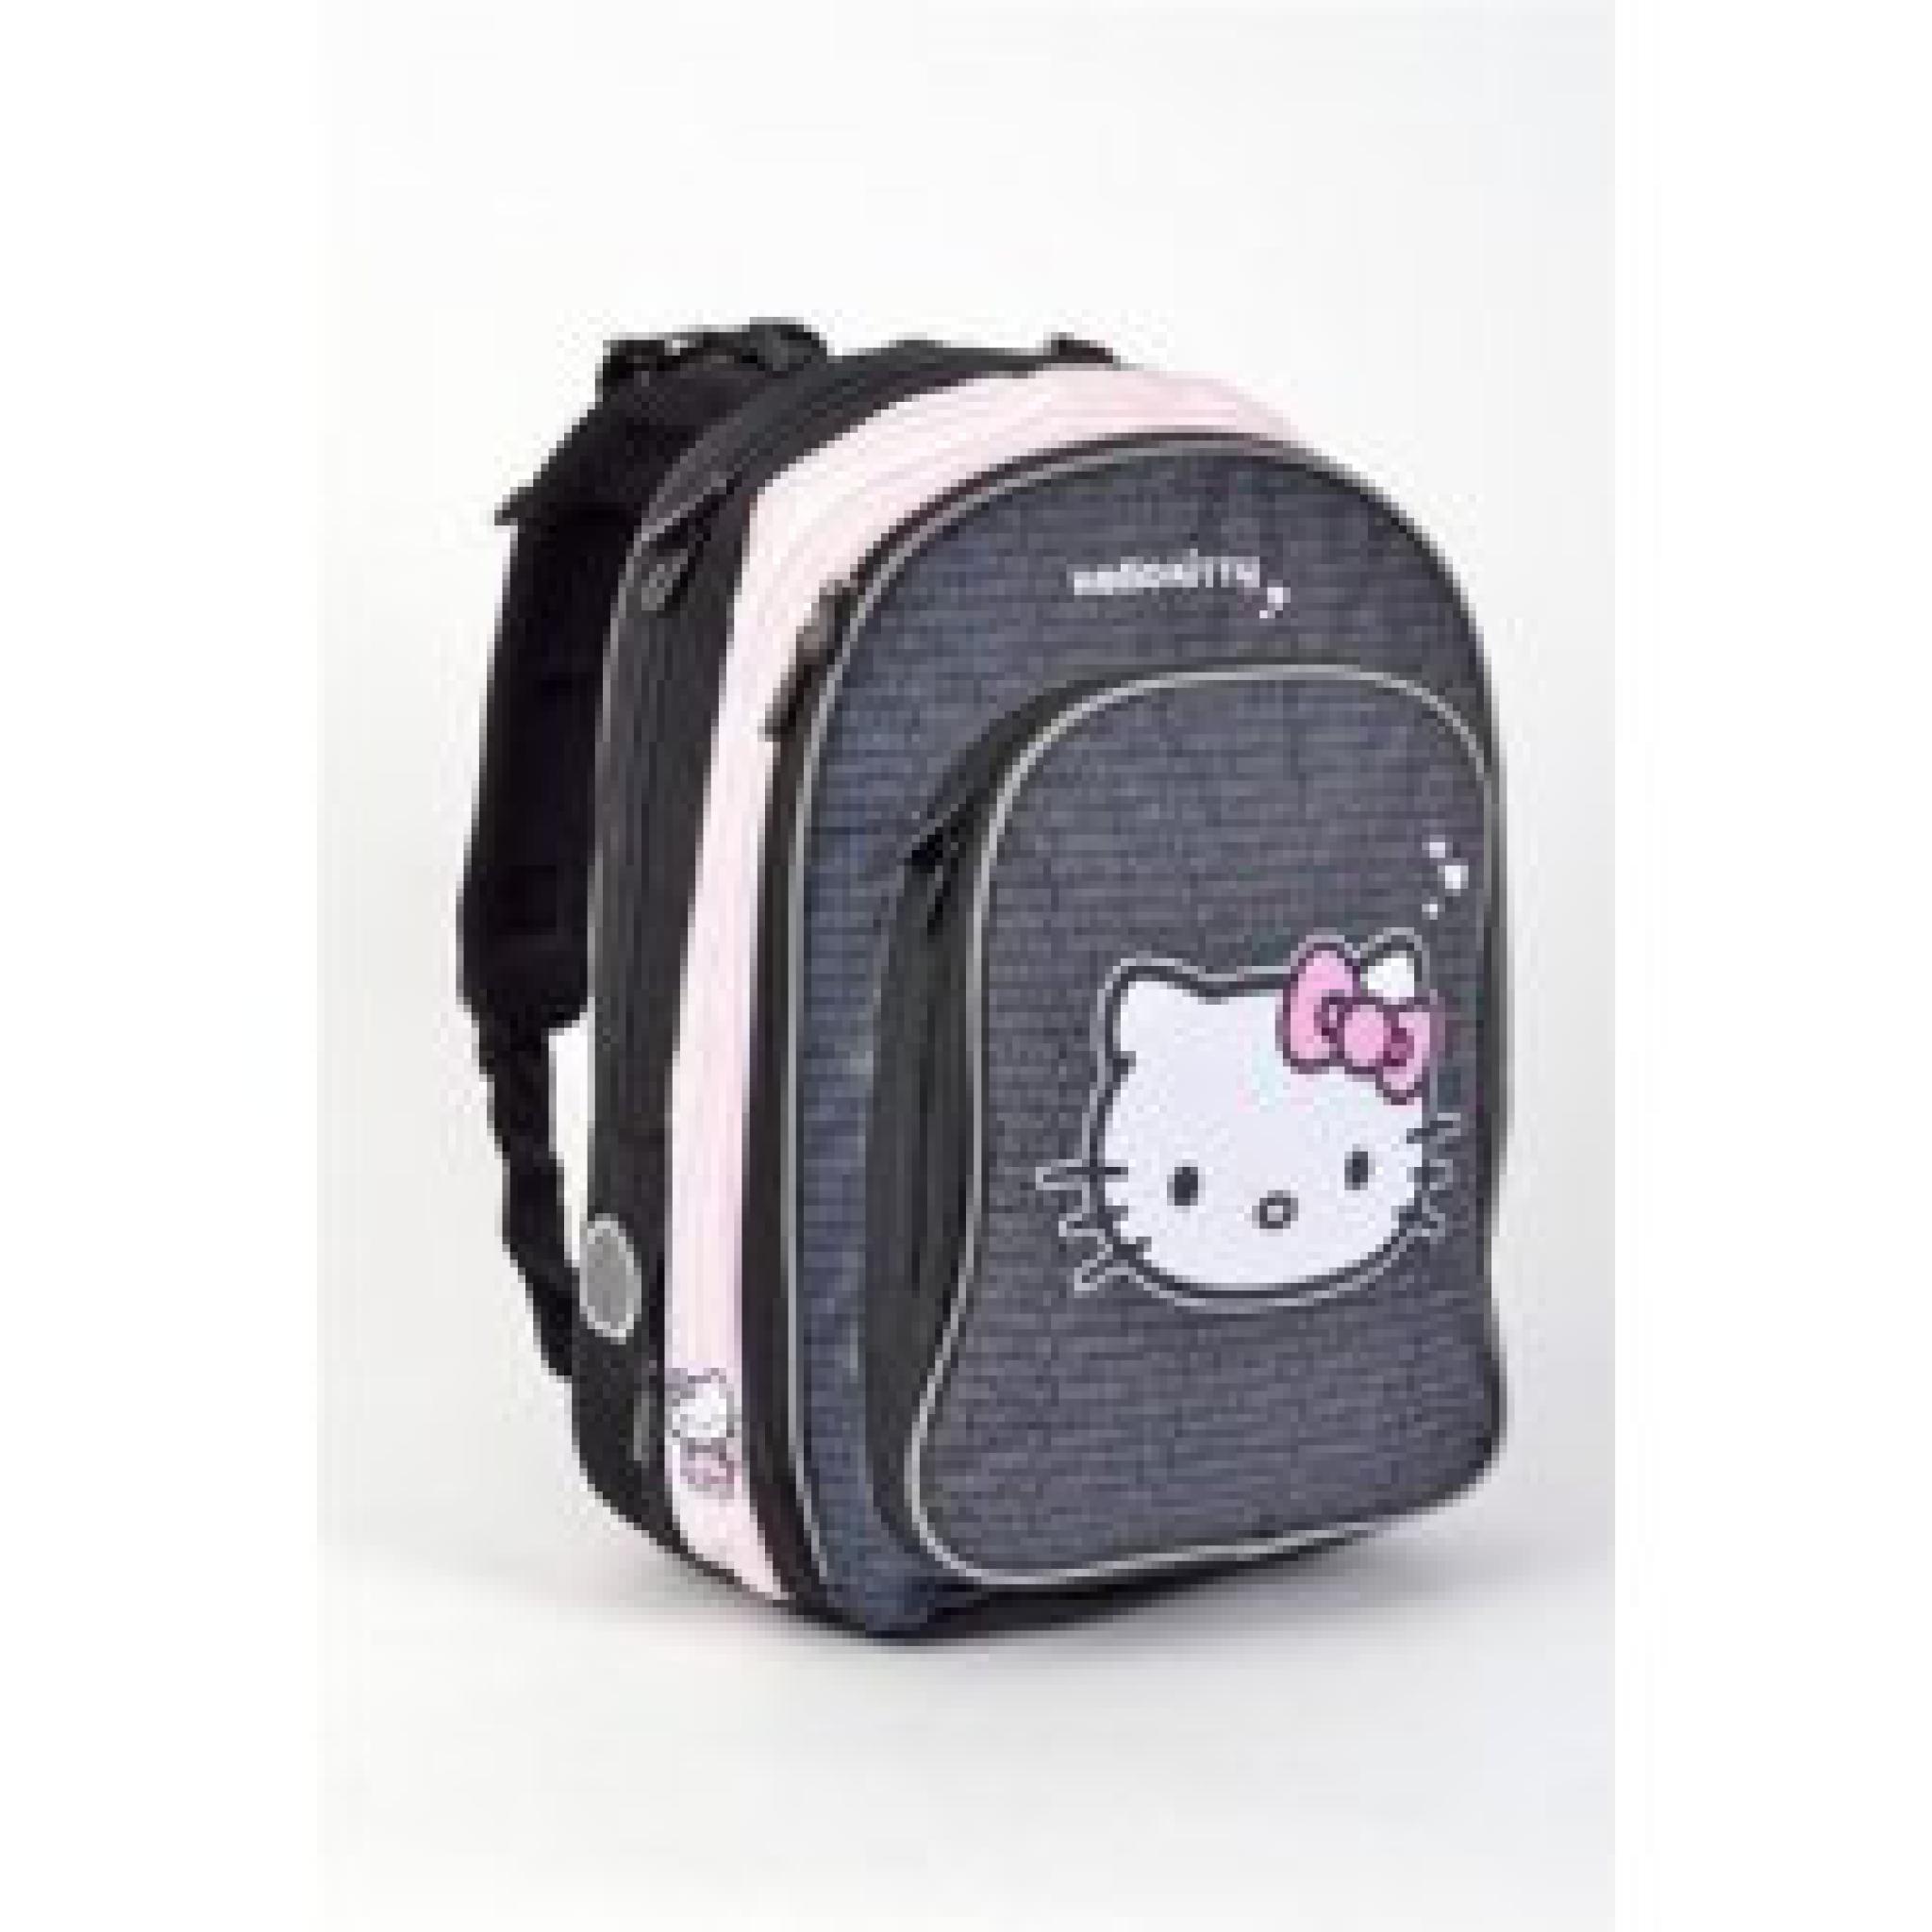 bfb7dc8474e Školní batoh anatomický ERGO Hello Kitty Black   Produkty ...